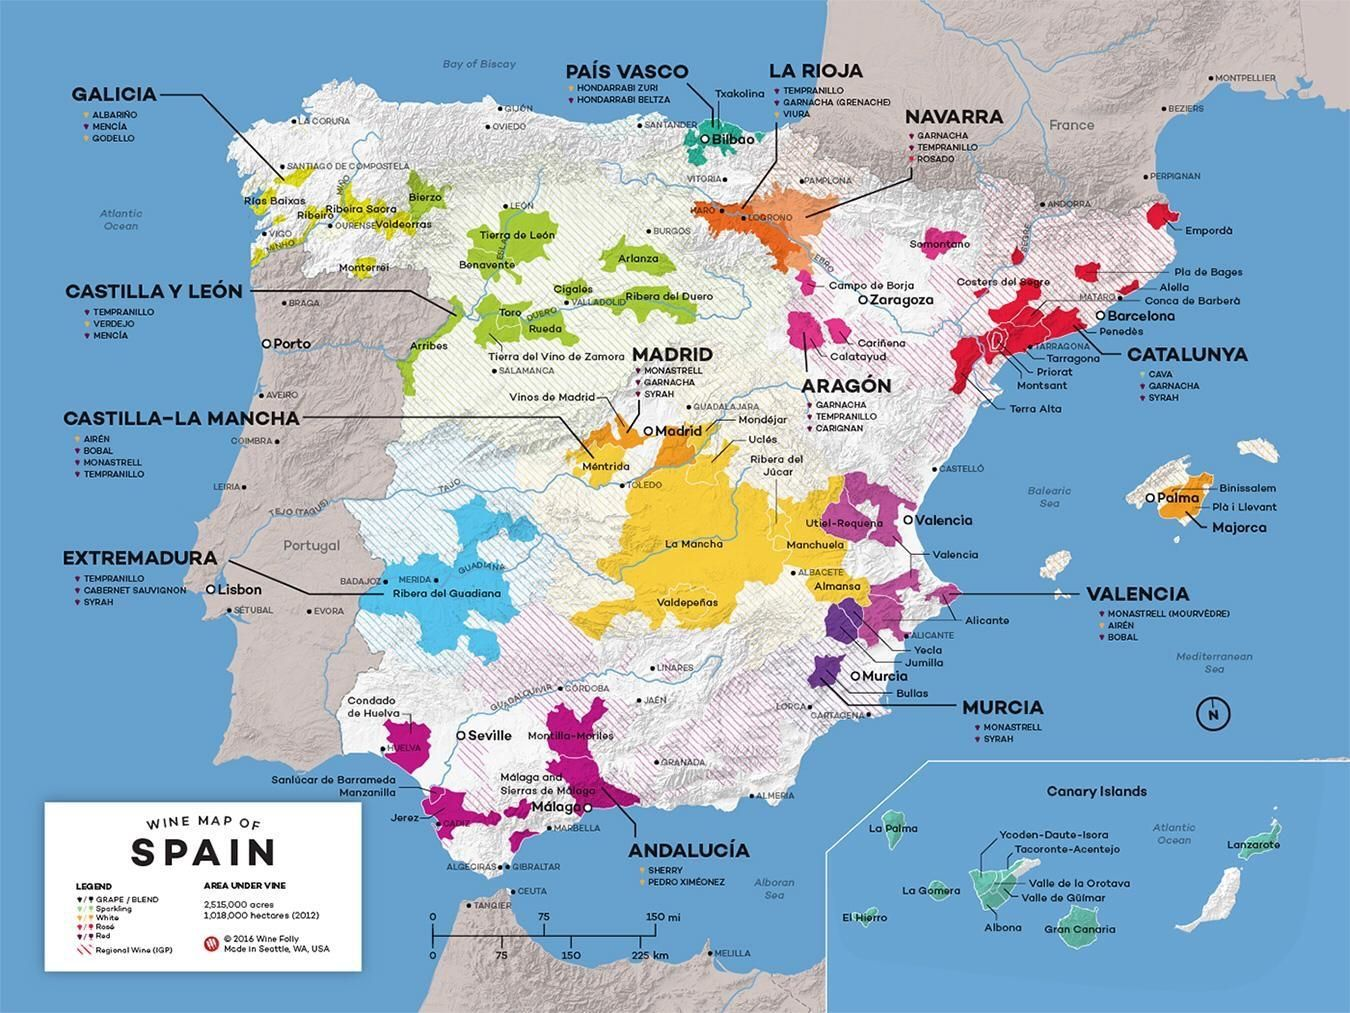 Mapa De Vinos De Espana Spain Vino De Espana Guia De Vinos